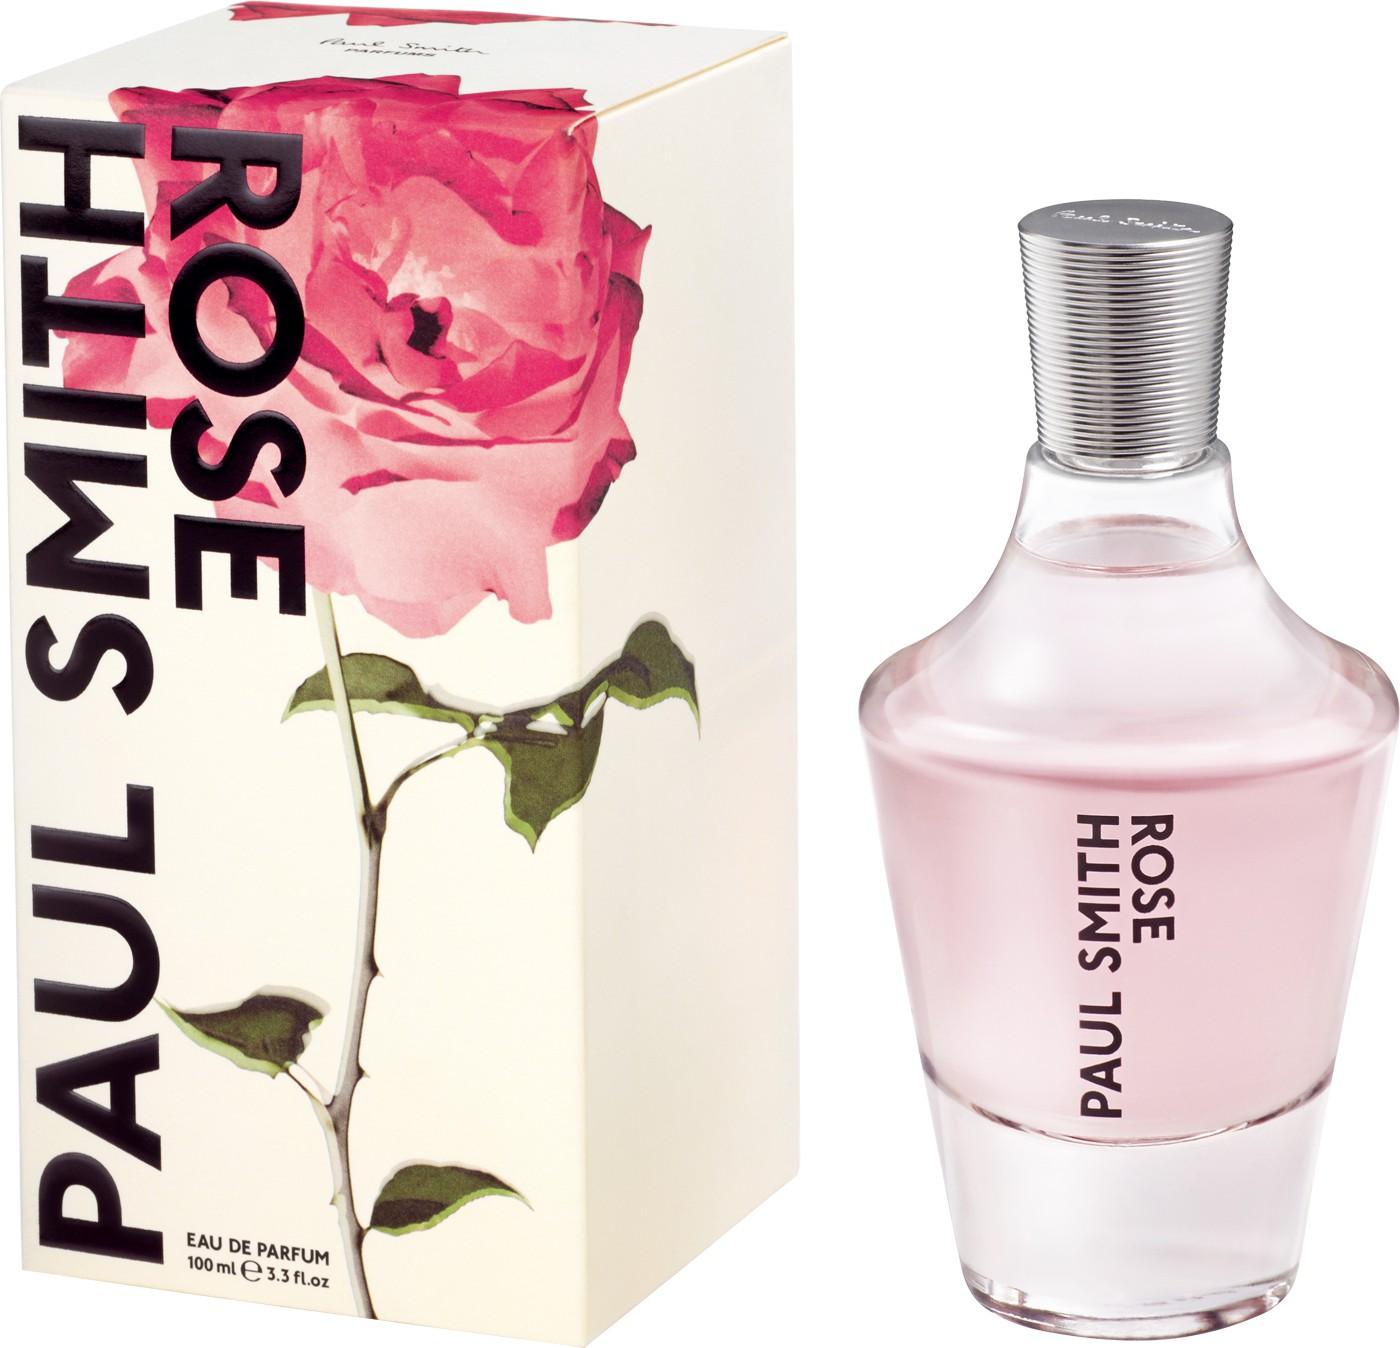 Paul Smith Rose аромат для женщин